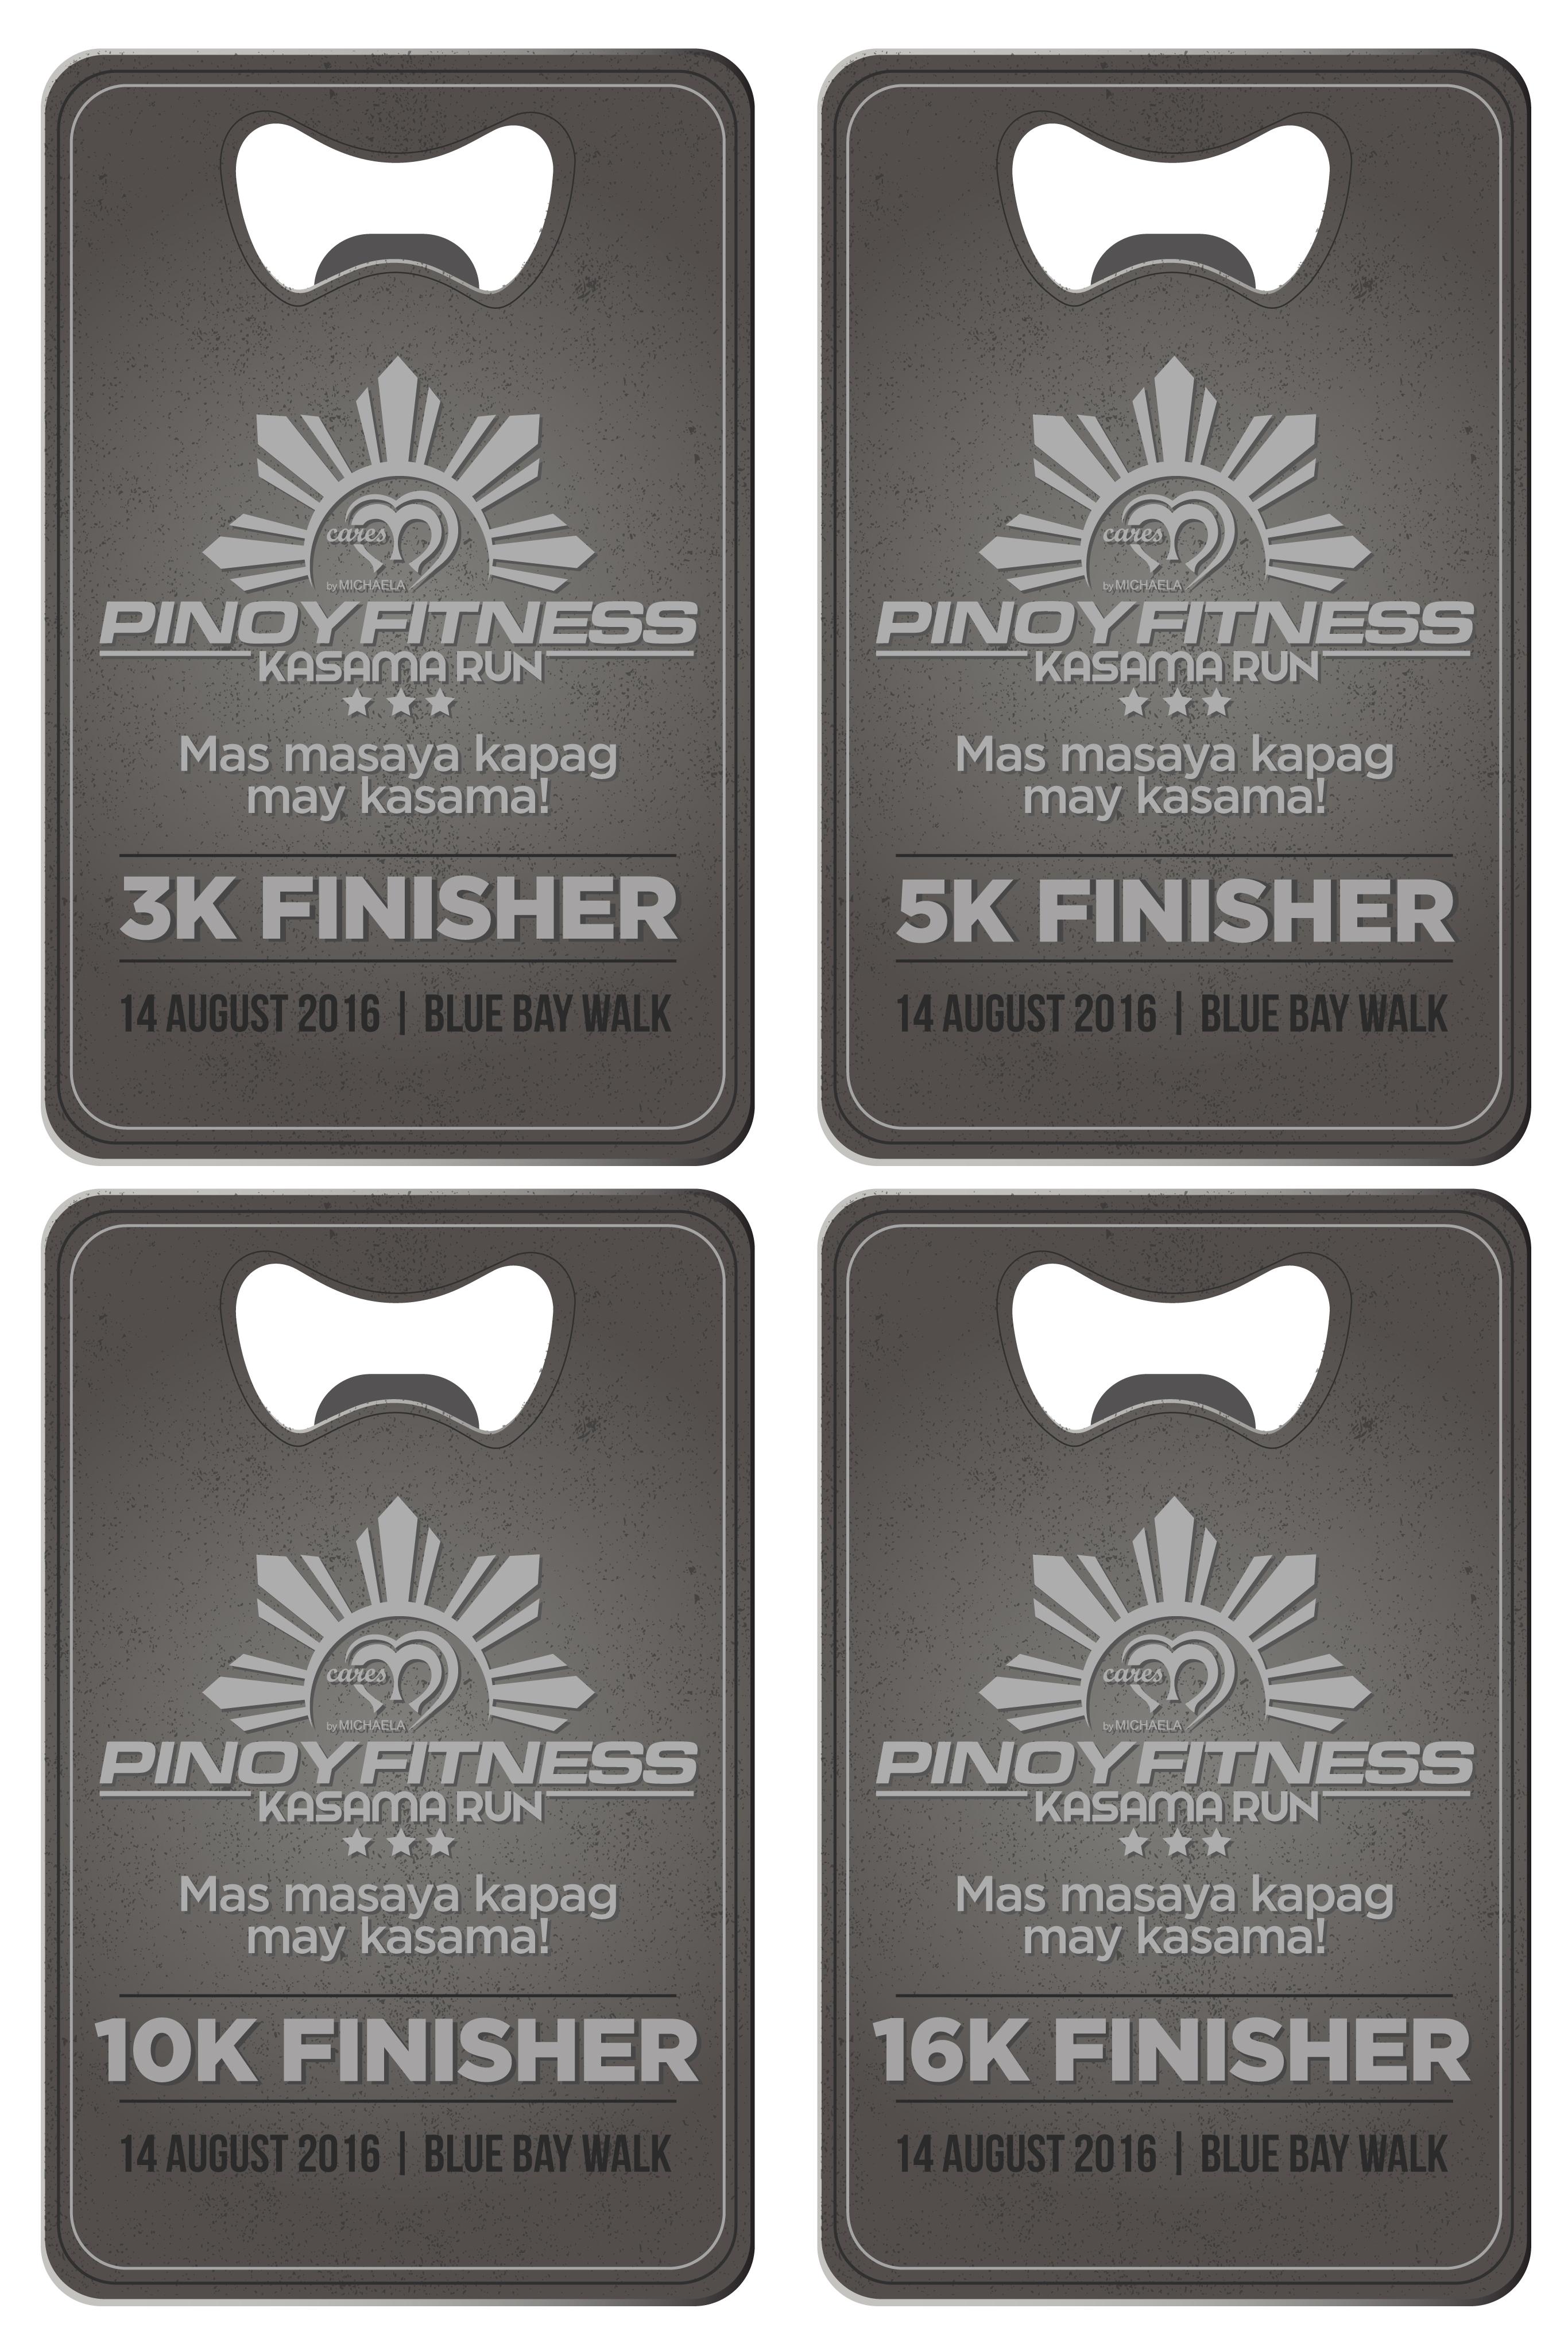 PF Kasama Run X Michaela Medals